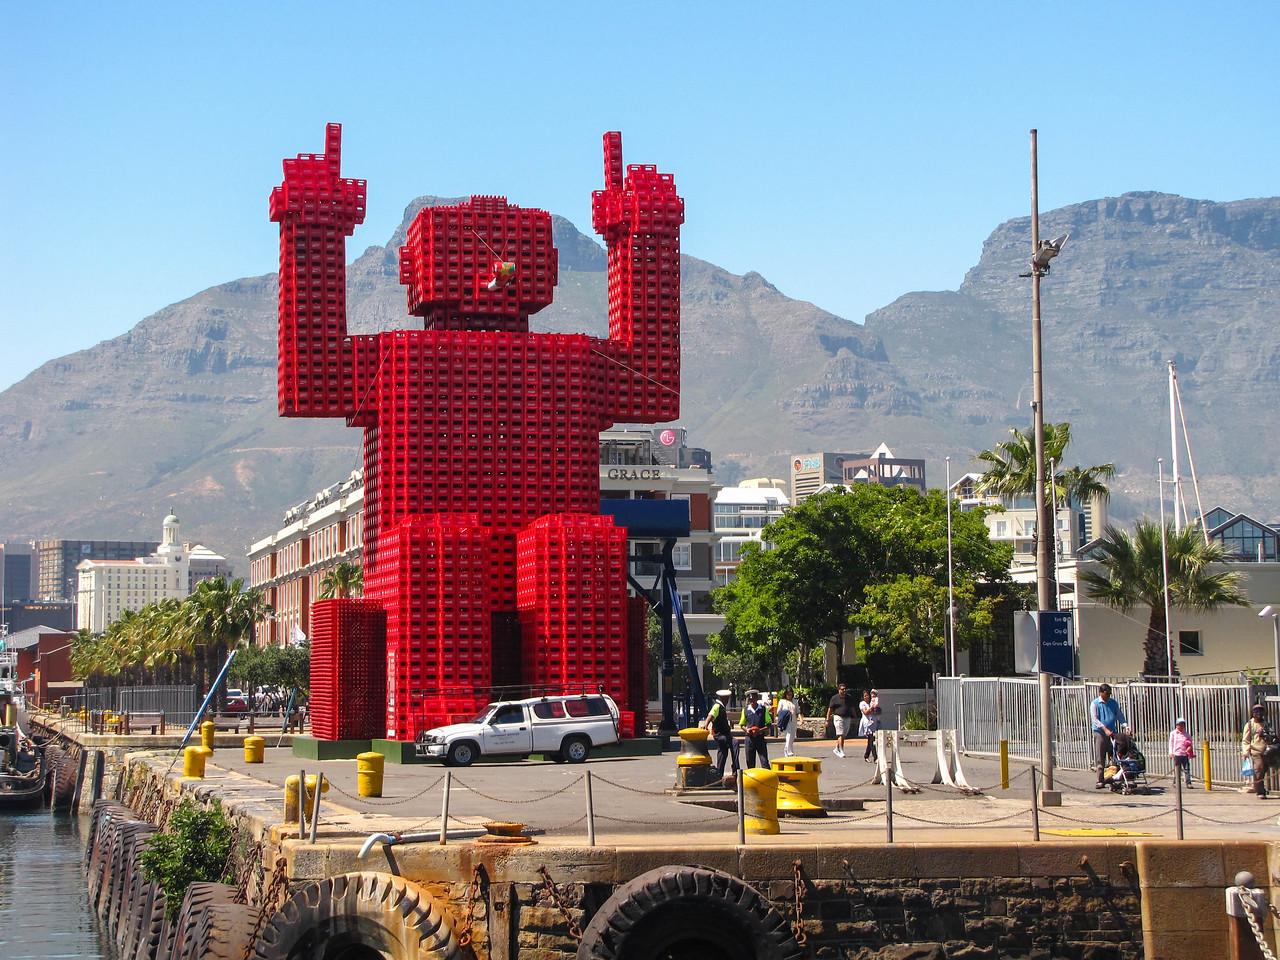 Coca Cola Crate Sculpture, V&A Waterfront